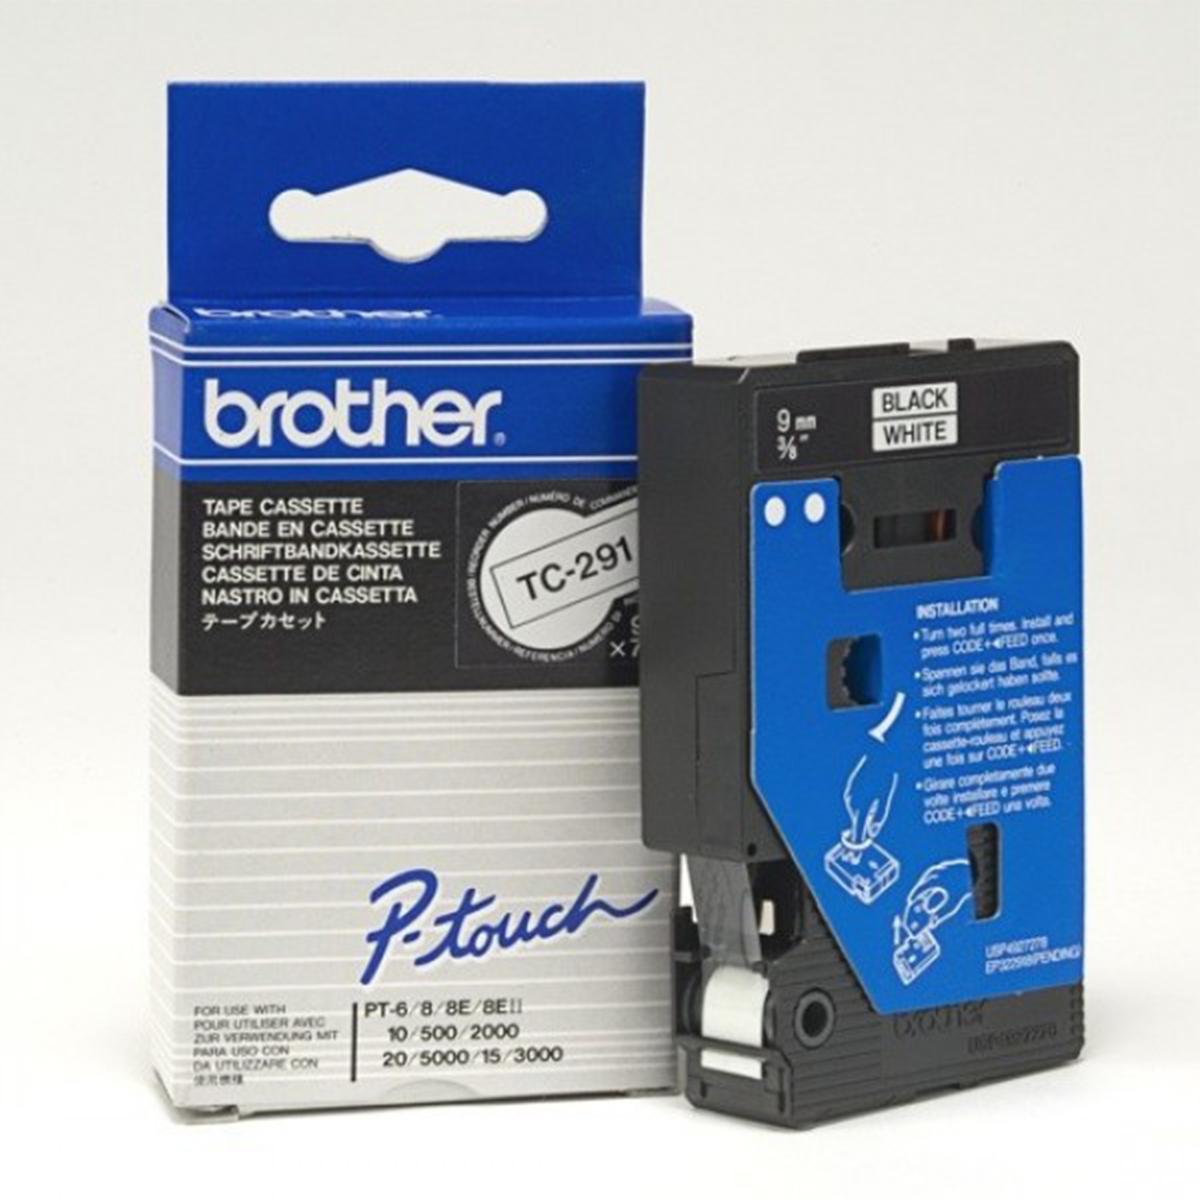 Brother TC291 Black on White